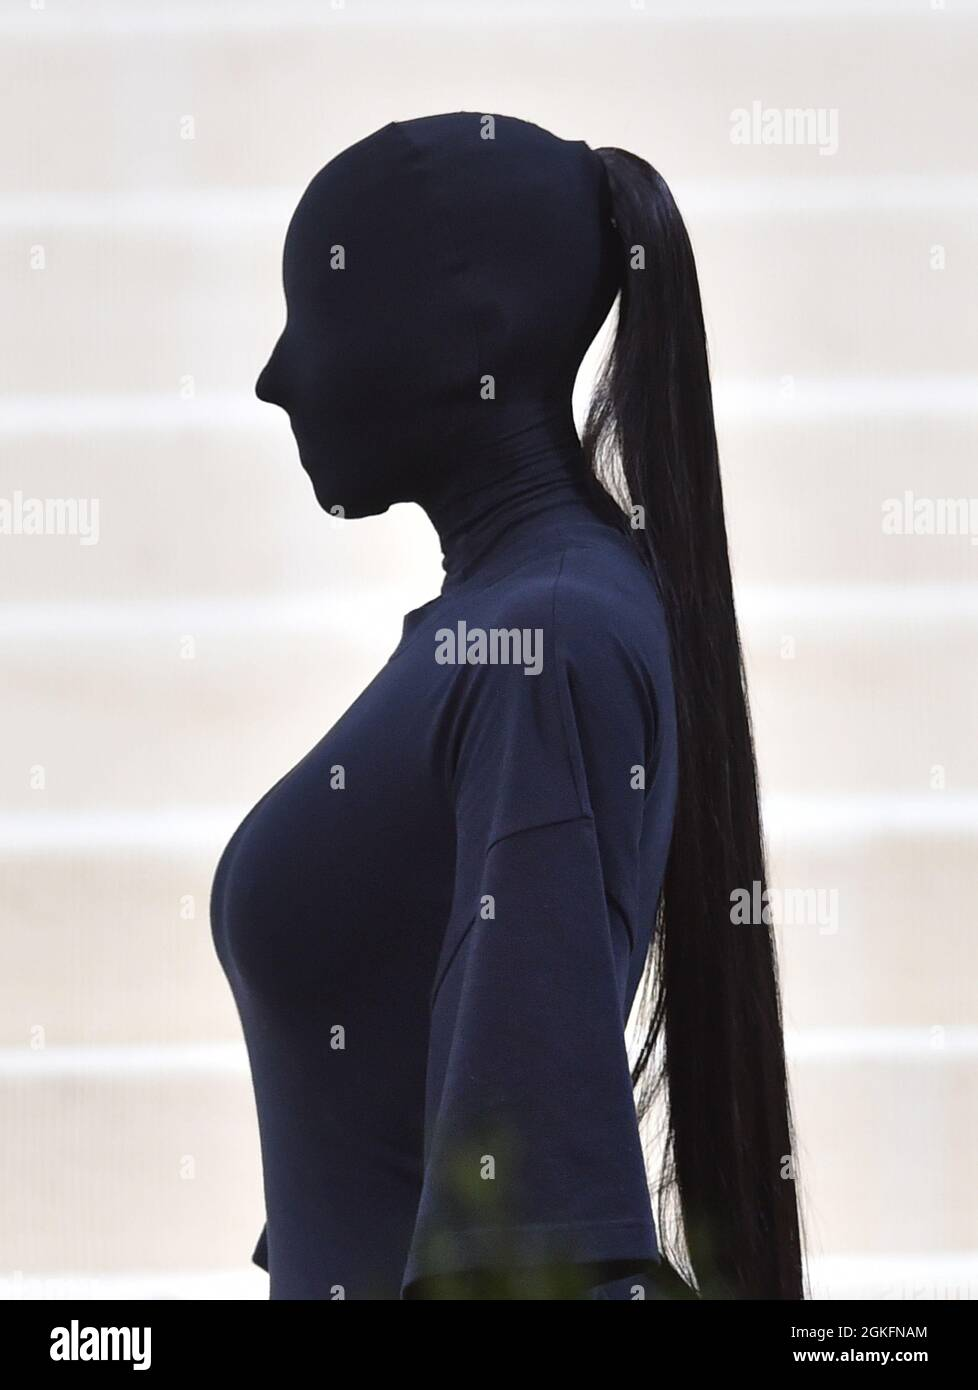 New York, New York, Stati Uniti. 13 settembre 2021. Kim Kardashian al Met Gala Benefit 'in America: A Lexicon of Fashion' del 2021 al Metropolitan Museum of Art il 13 settembre 2021 a New York City. Credit: John Palmer/Media Punch/Alamy Live News Foto Stock